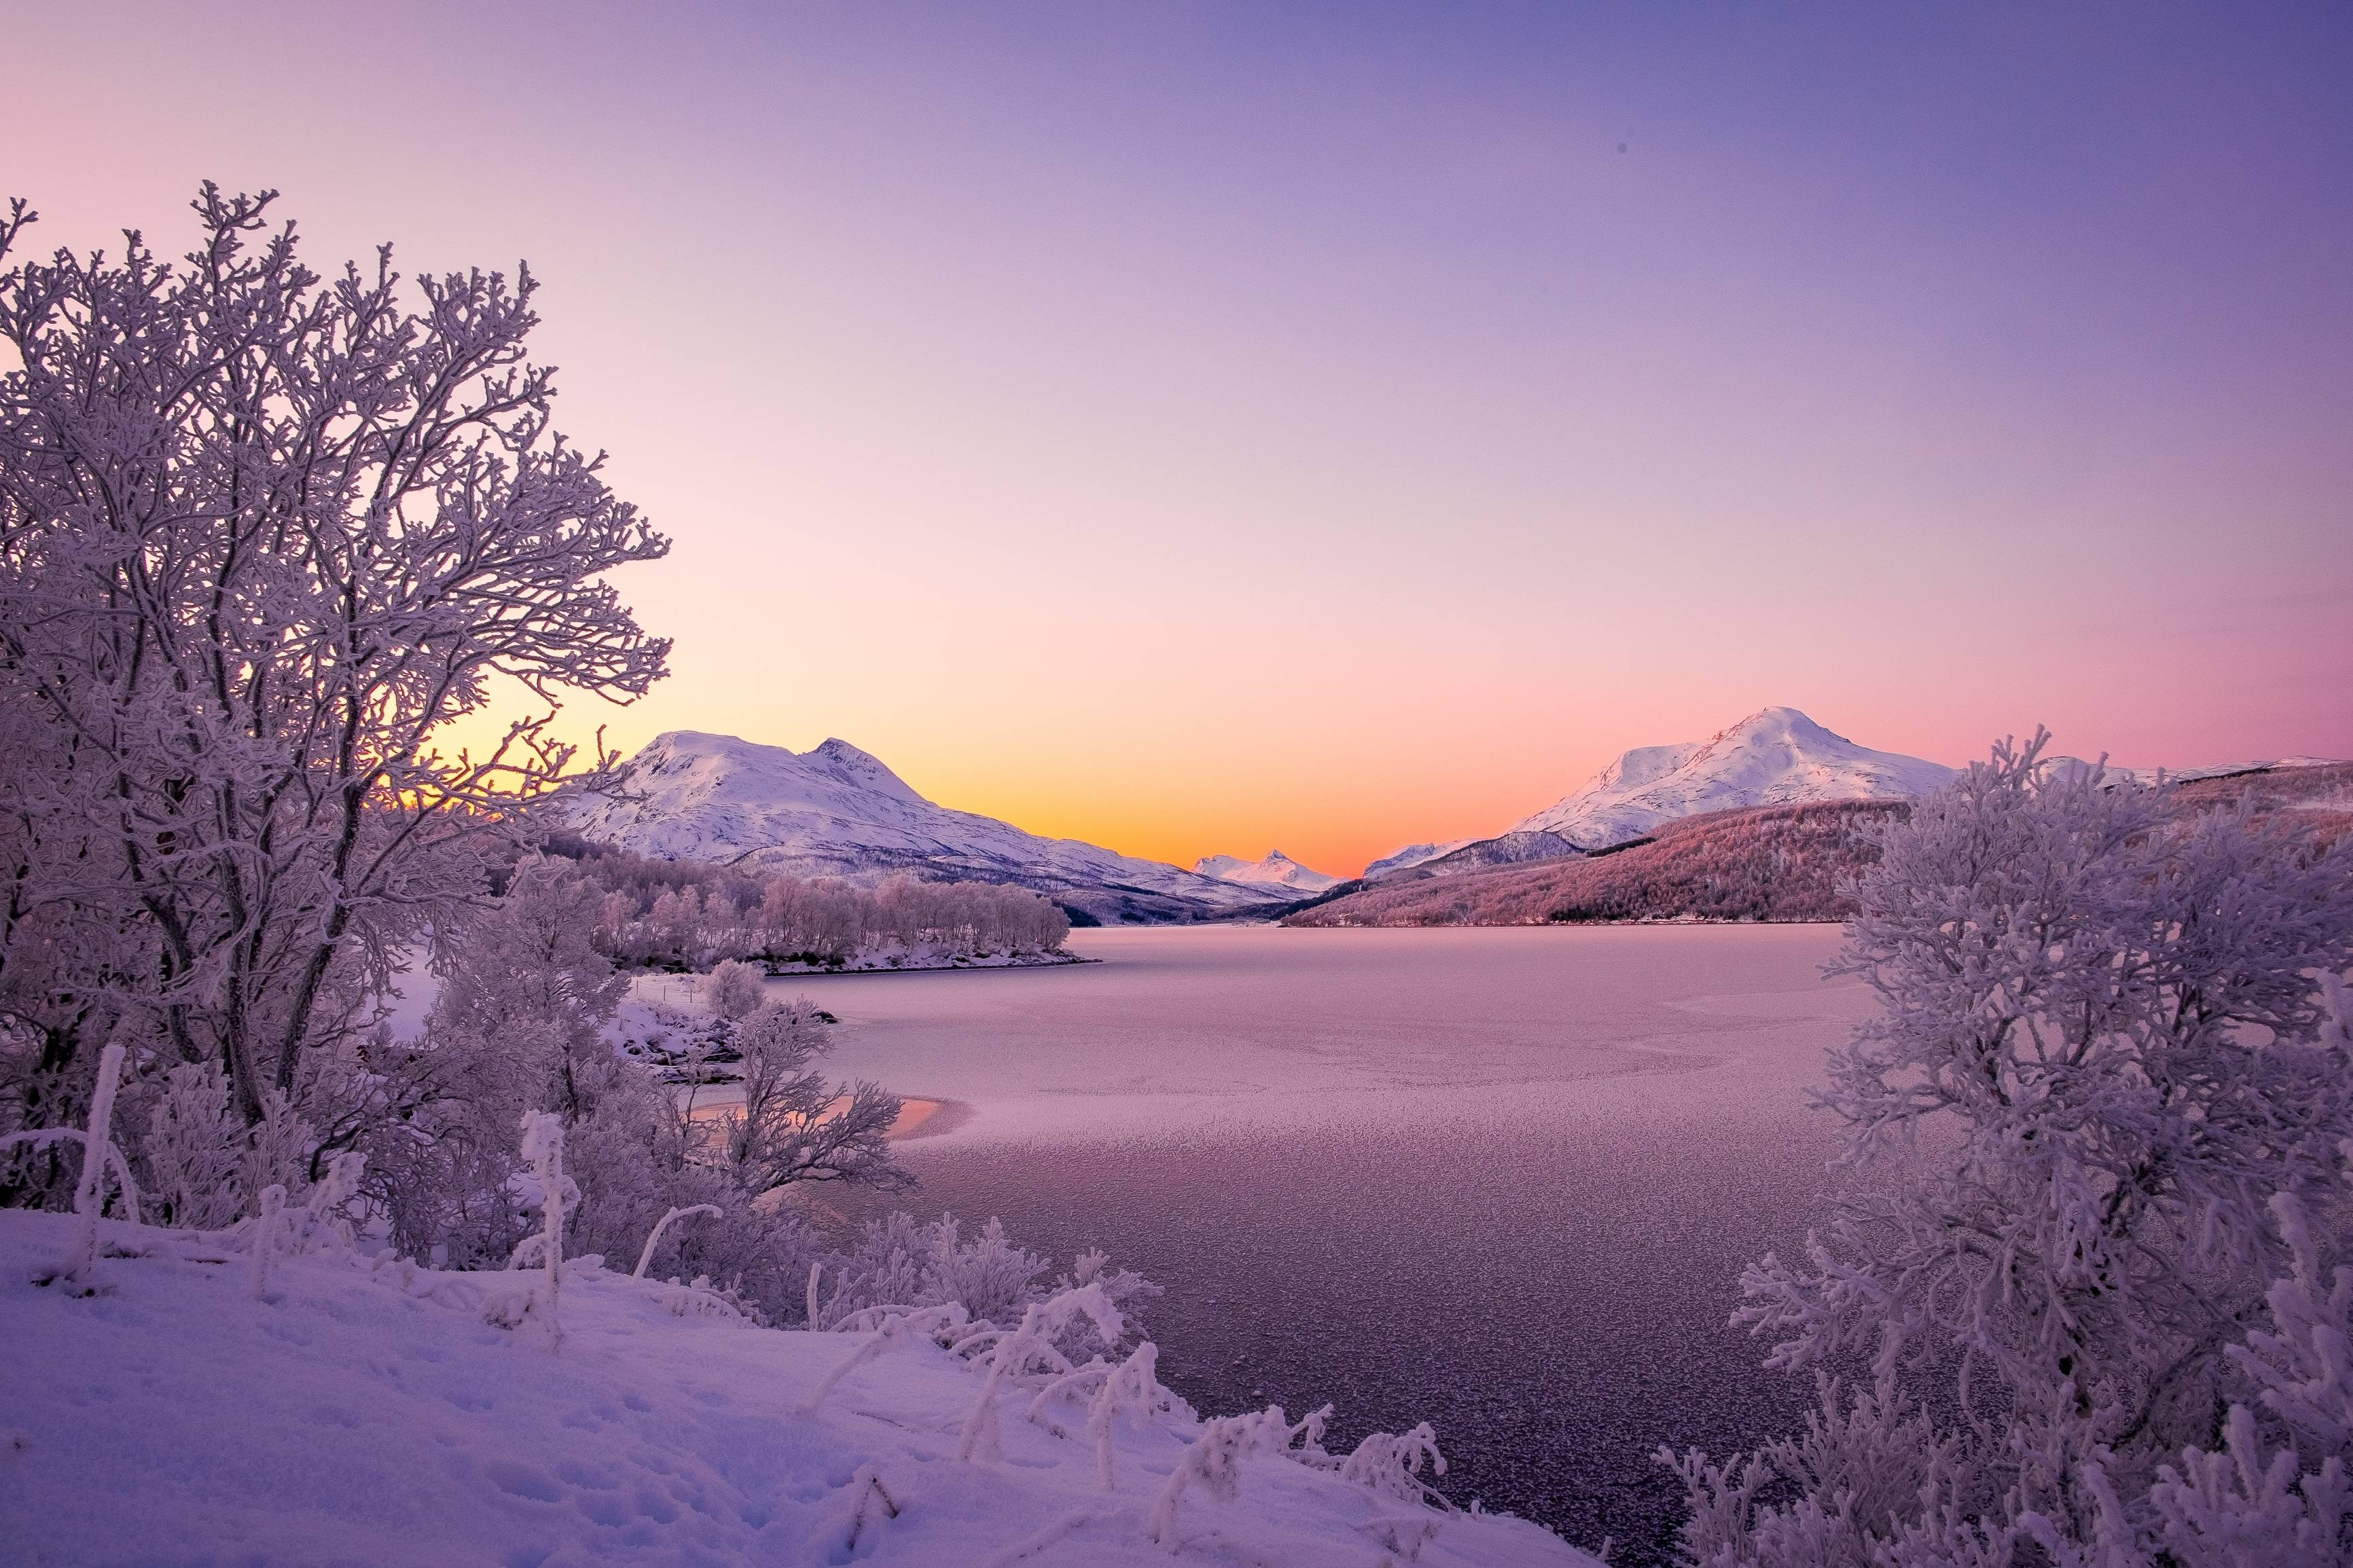 обои Stor Vann lake, Storvann lake, Norway, Scandinavian Mountains картинки фото